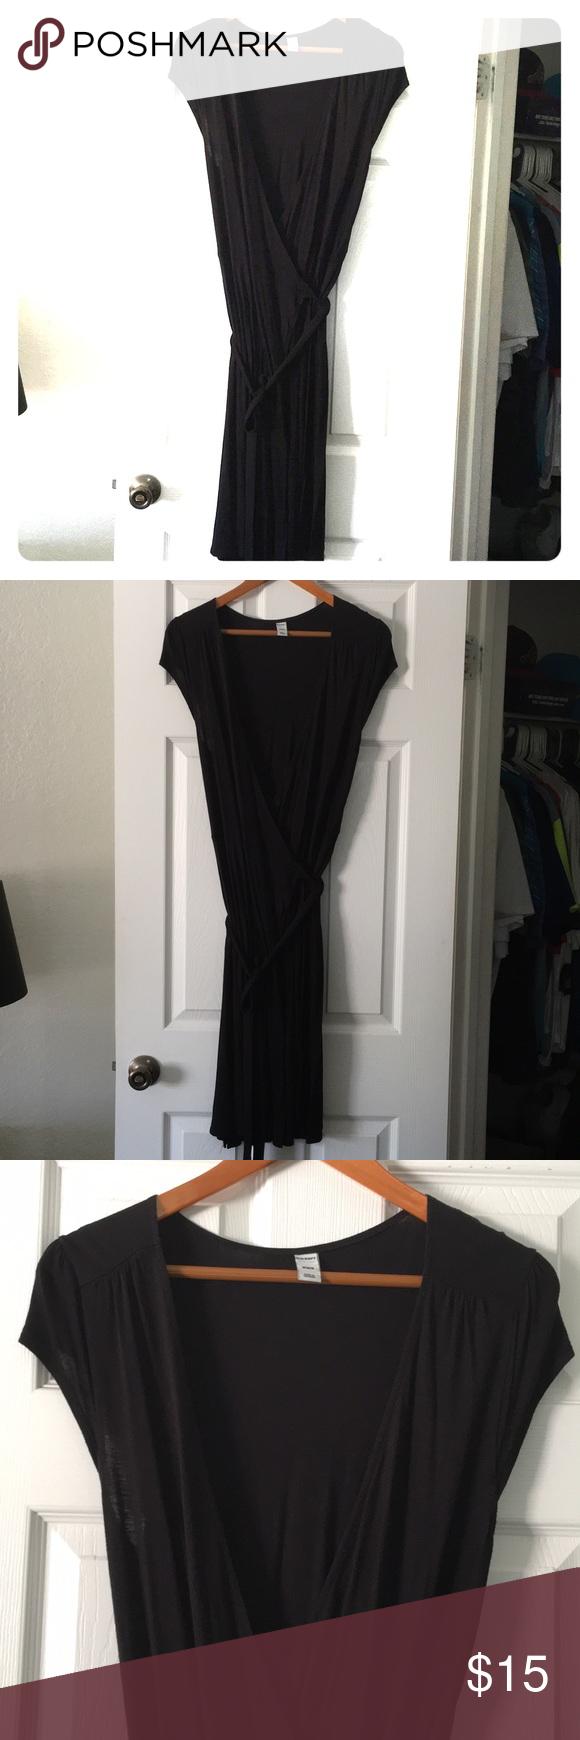 Old navy black wrap dress size medium wrap dresses wraps and navy